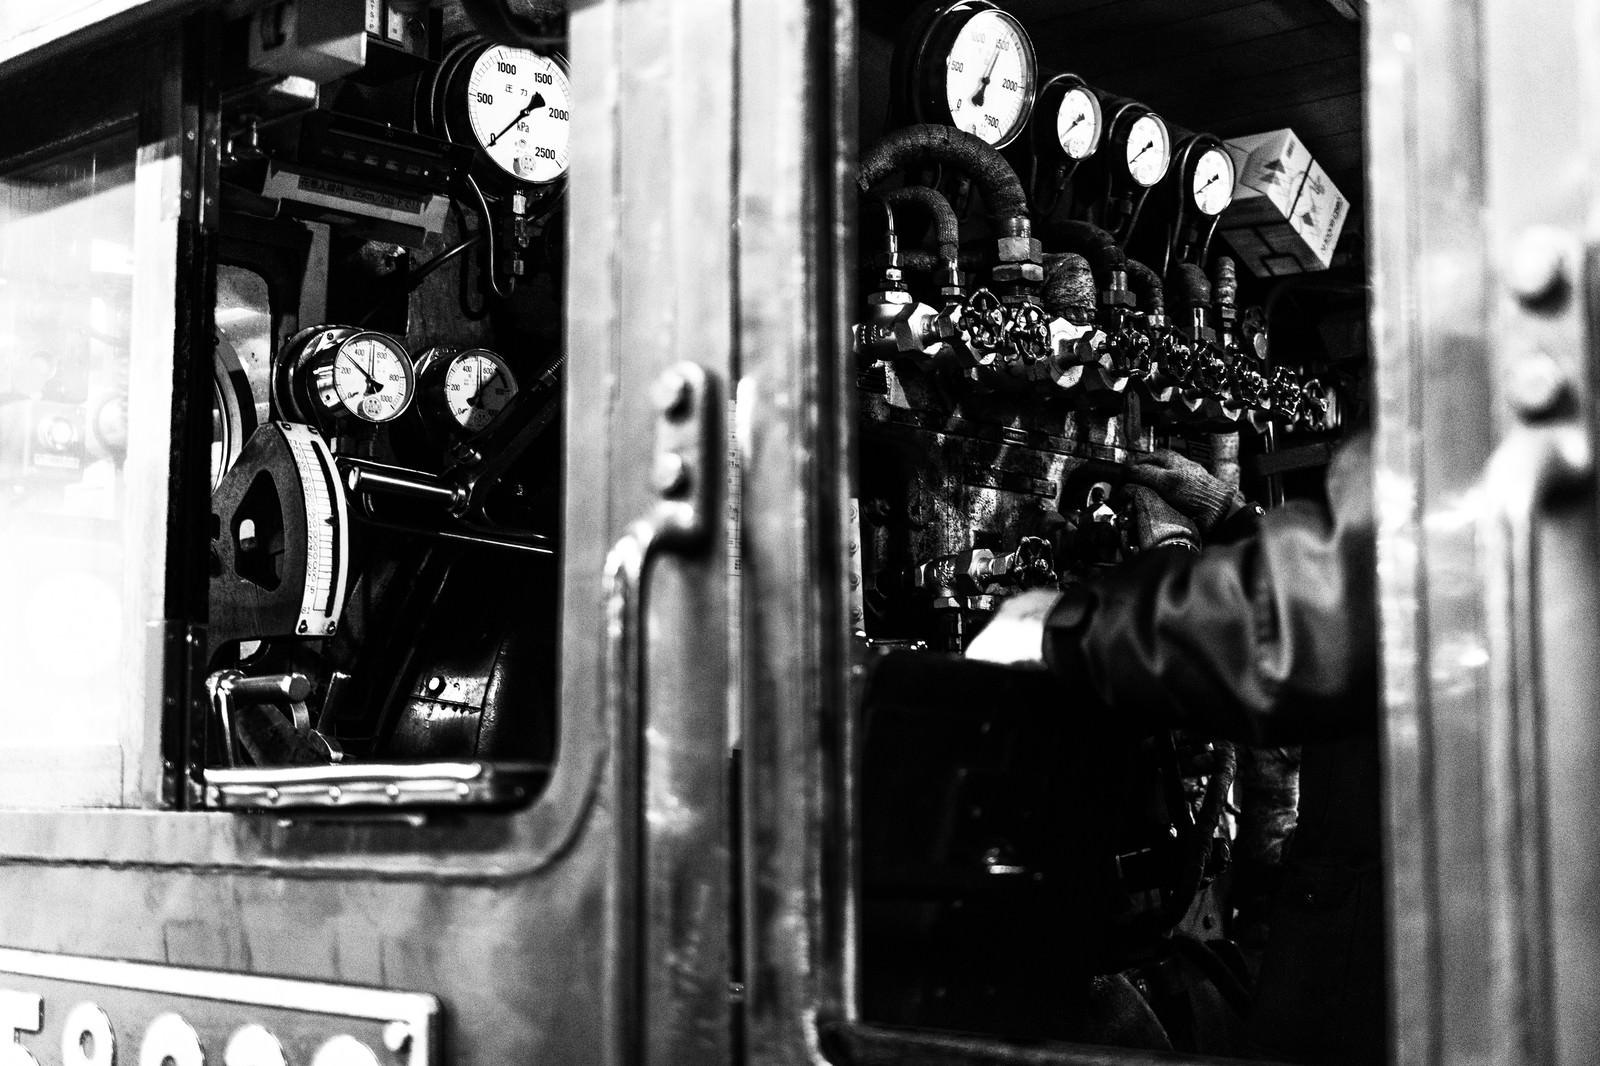 「蒸気機関車運転席蒸気機関車運転席」のフリー写真素材を拡大